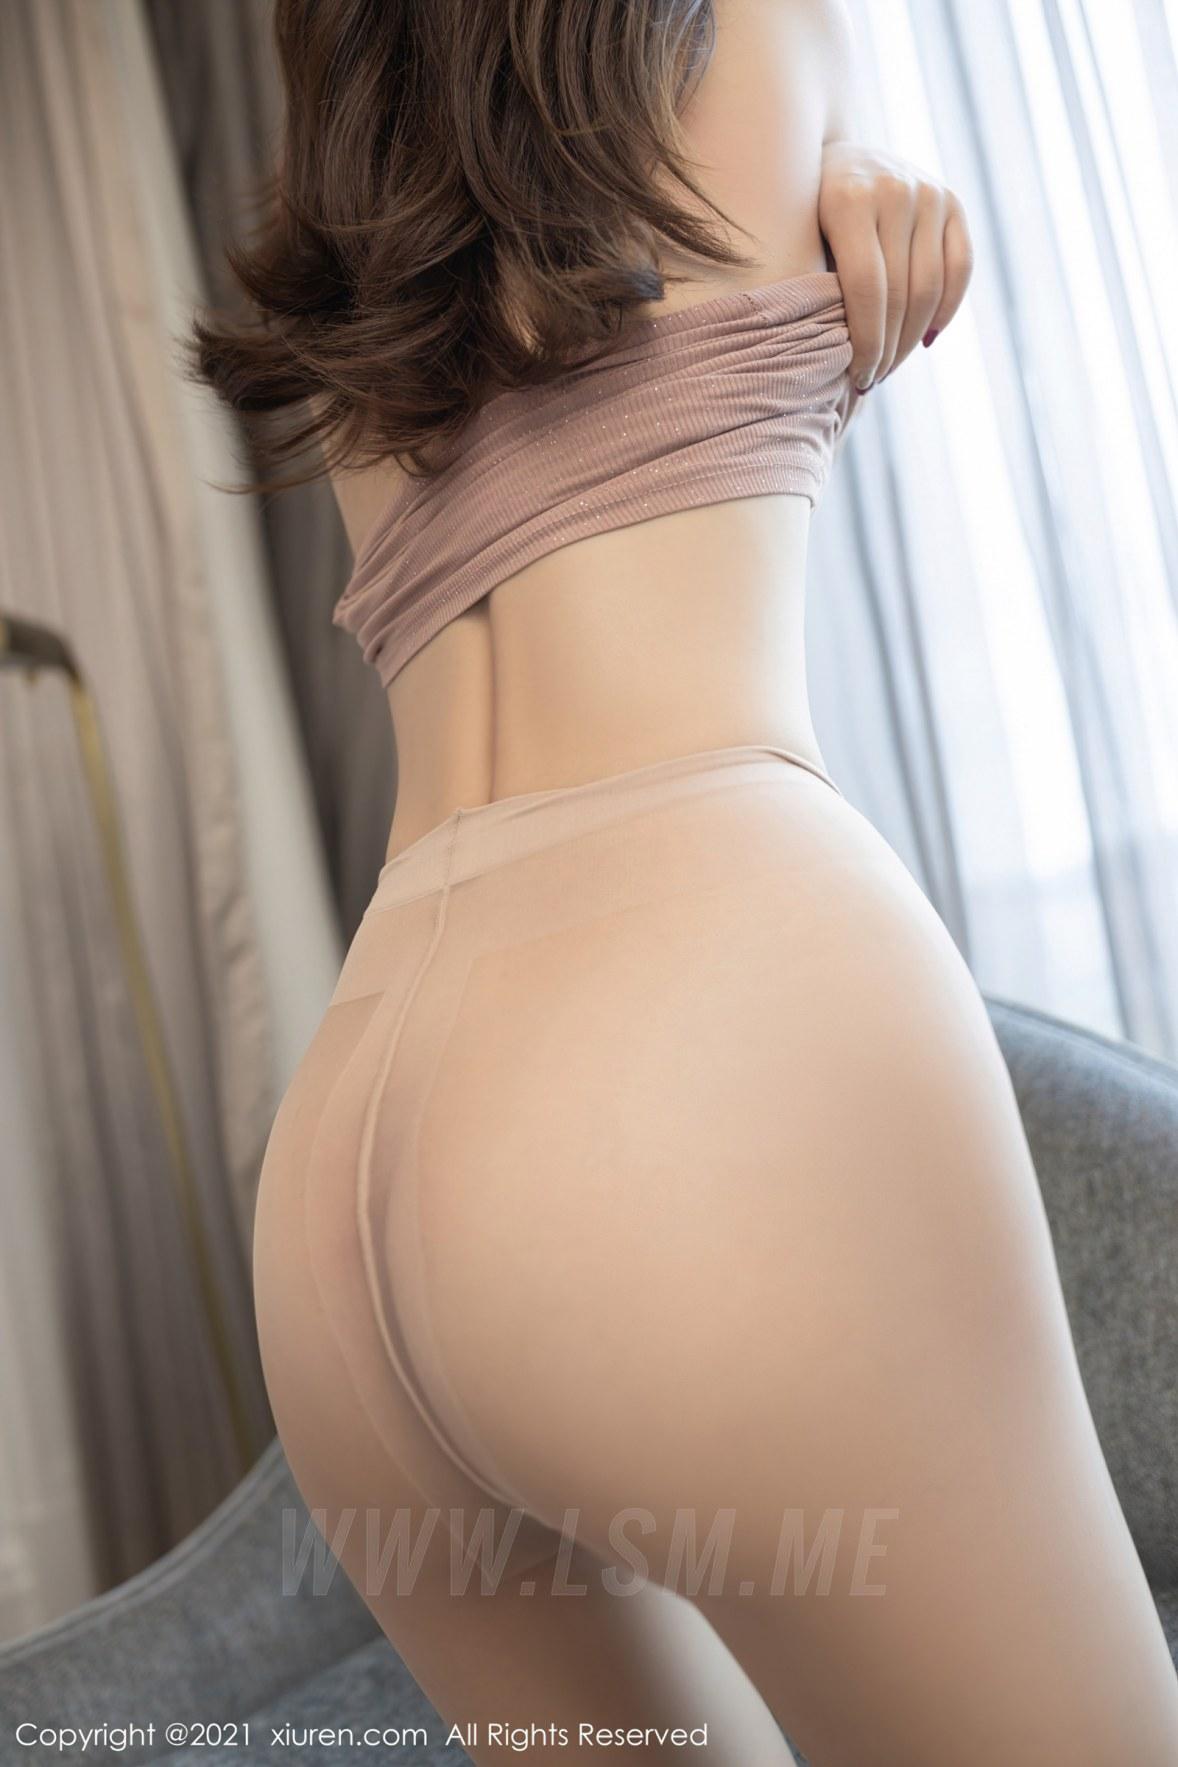 3780 058 79m 3600 5400 - XiuRen 秀人 No.3780 裸色裙主题系列 唐安琪 澳门旅拍写真22 - 秀人网 -【免费在线写真】【丽人丝语】